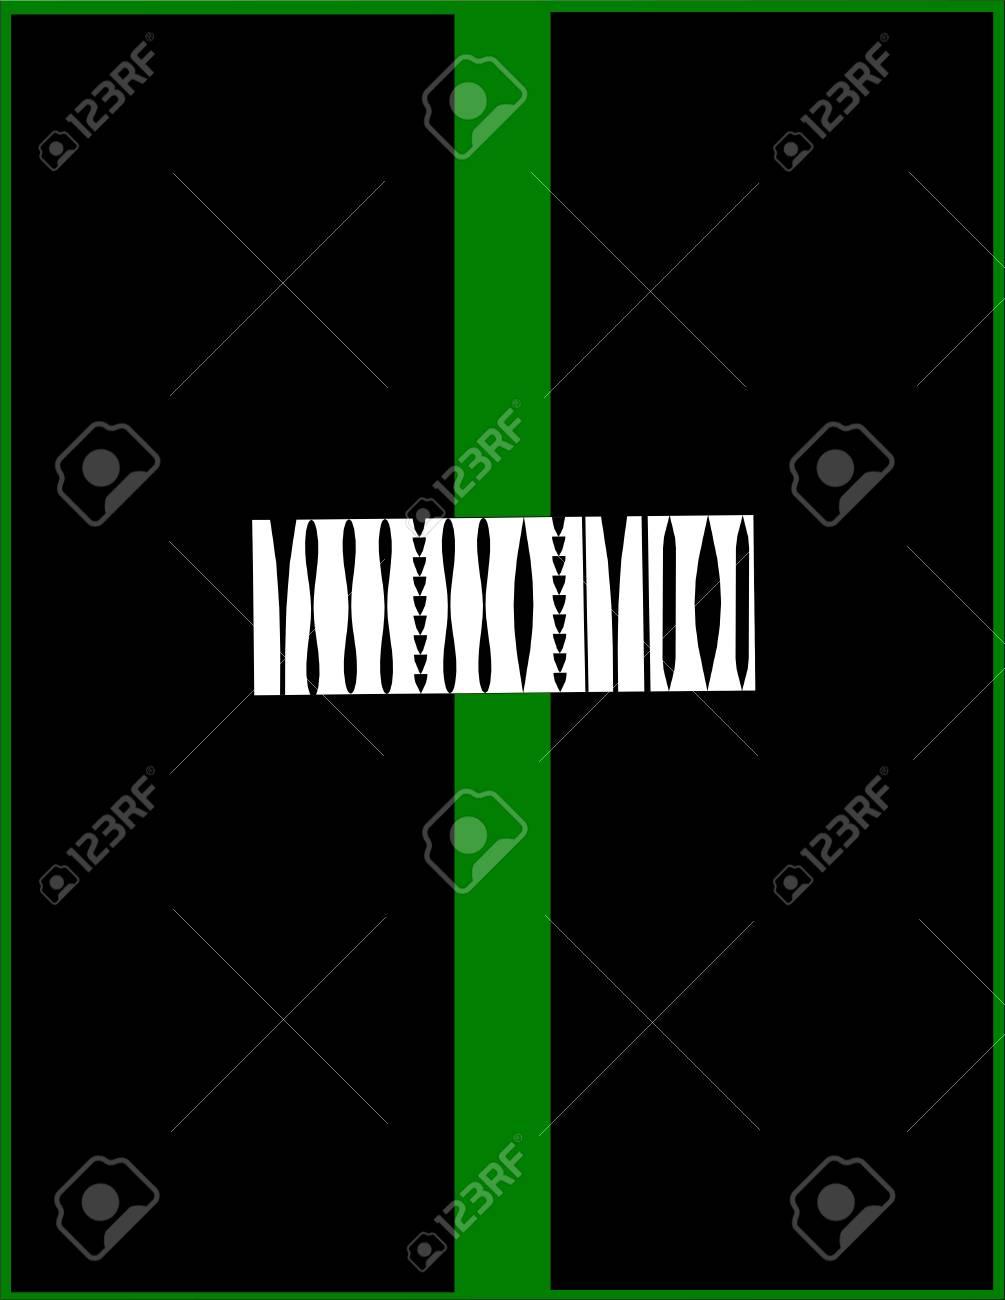 Derriere La Porte Verte Element De Code A Barres Clip Art Libres De